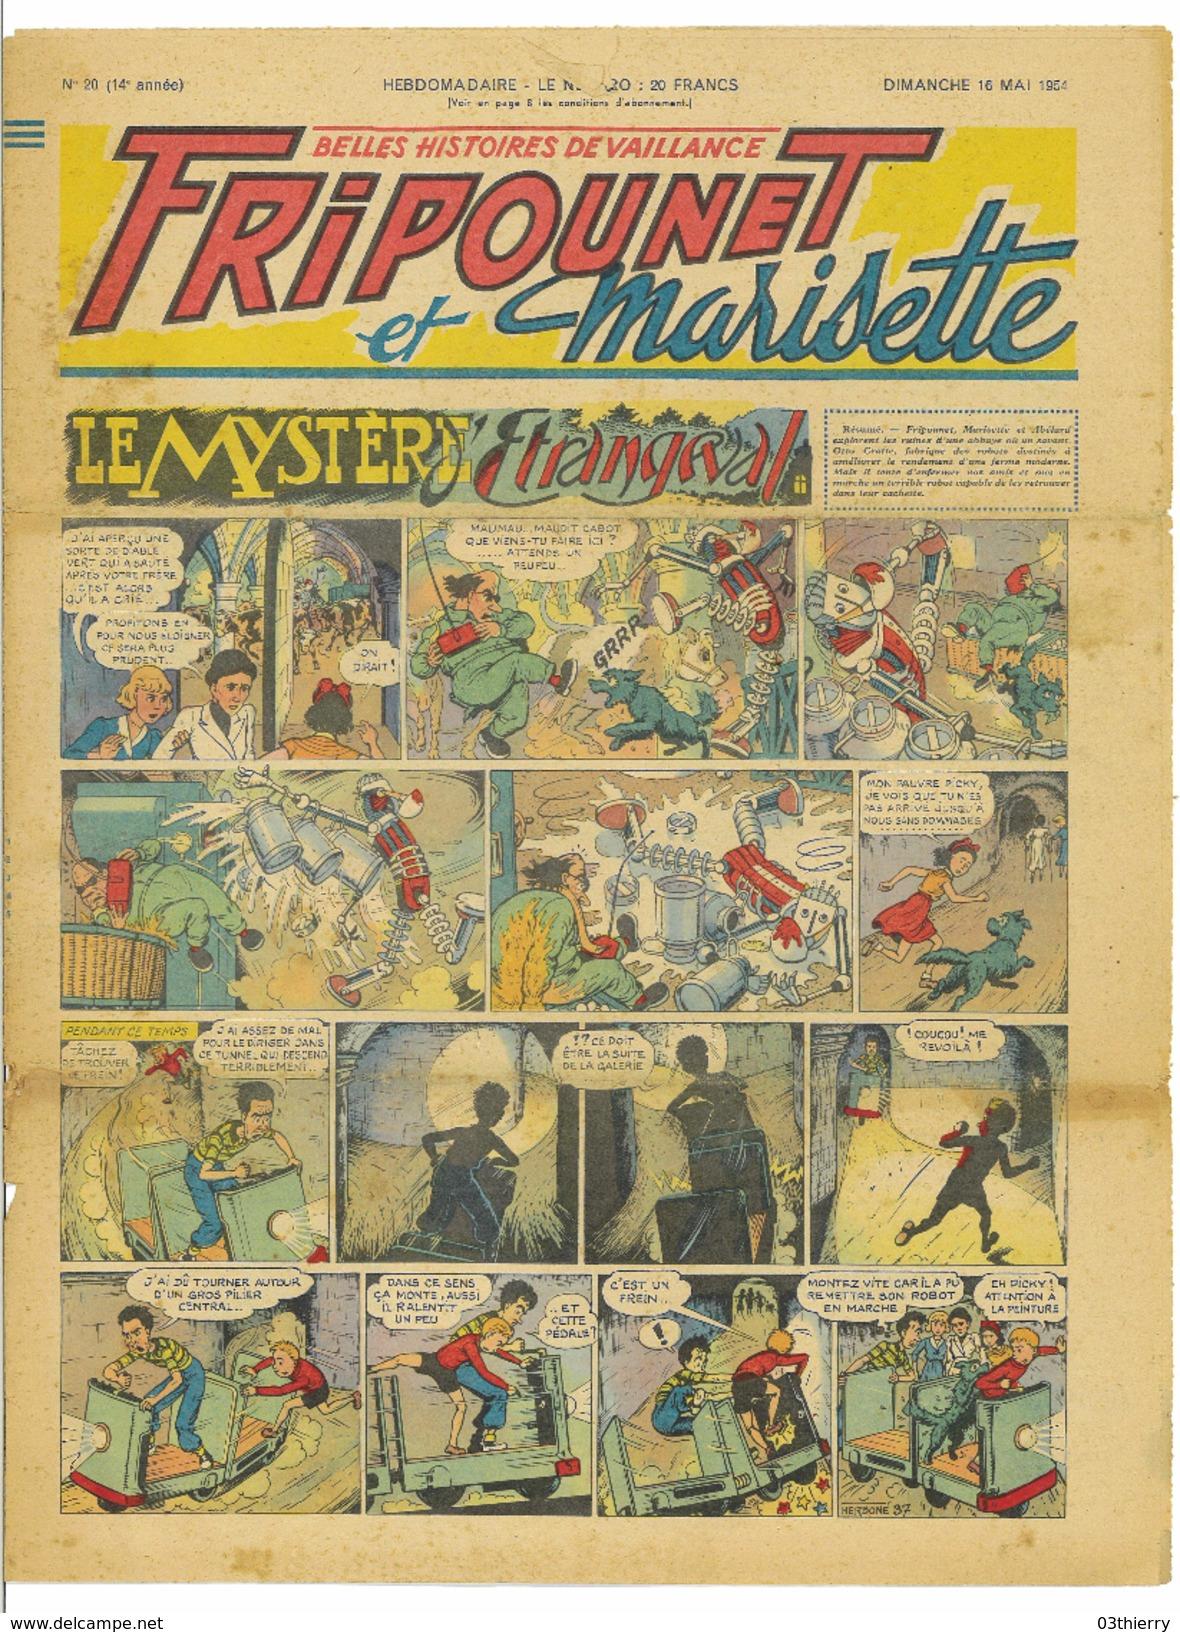 JOURNAL FRIPOUNET ET MARISETTE N°20 14eme ANNEE 16 MAI 1954 LE MYSTERE D'ETRANGEVAL - 1901-1940